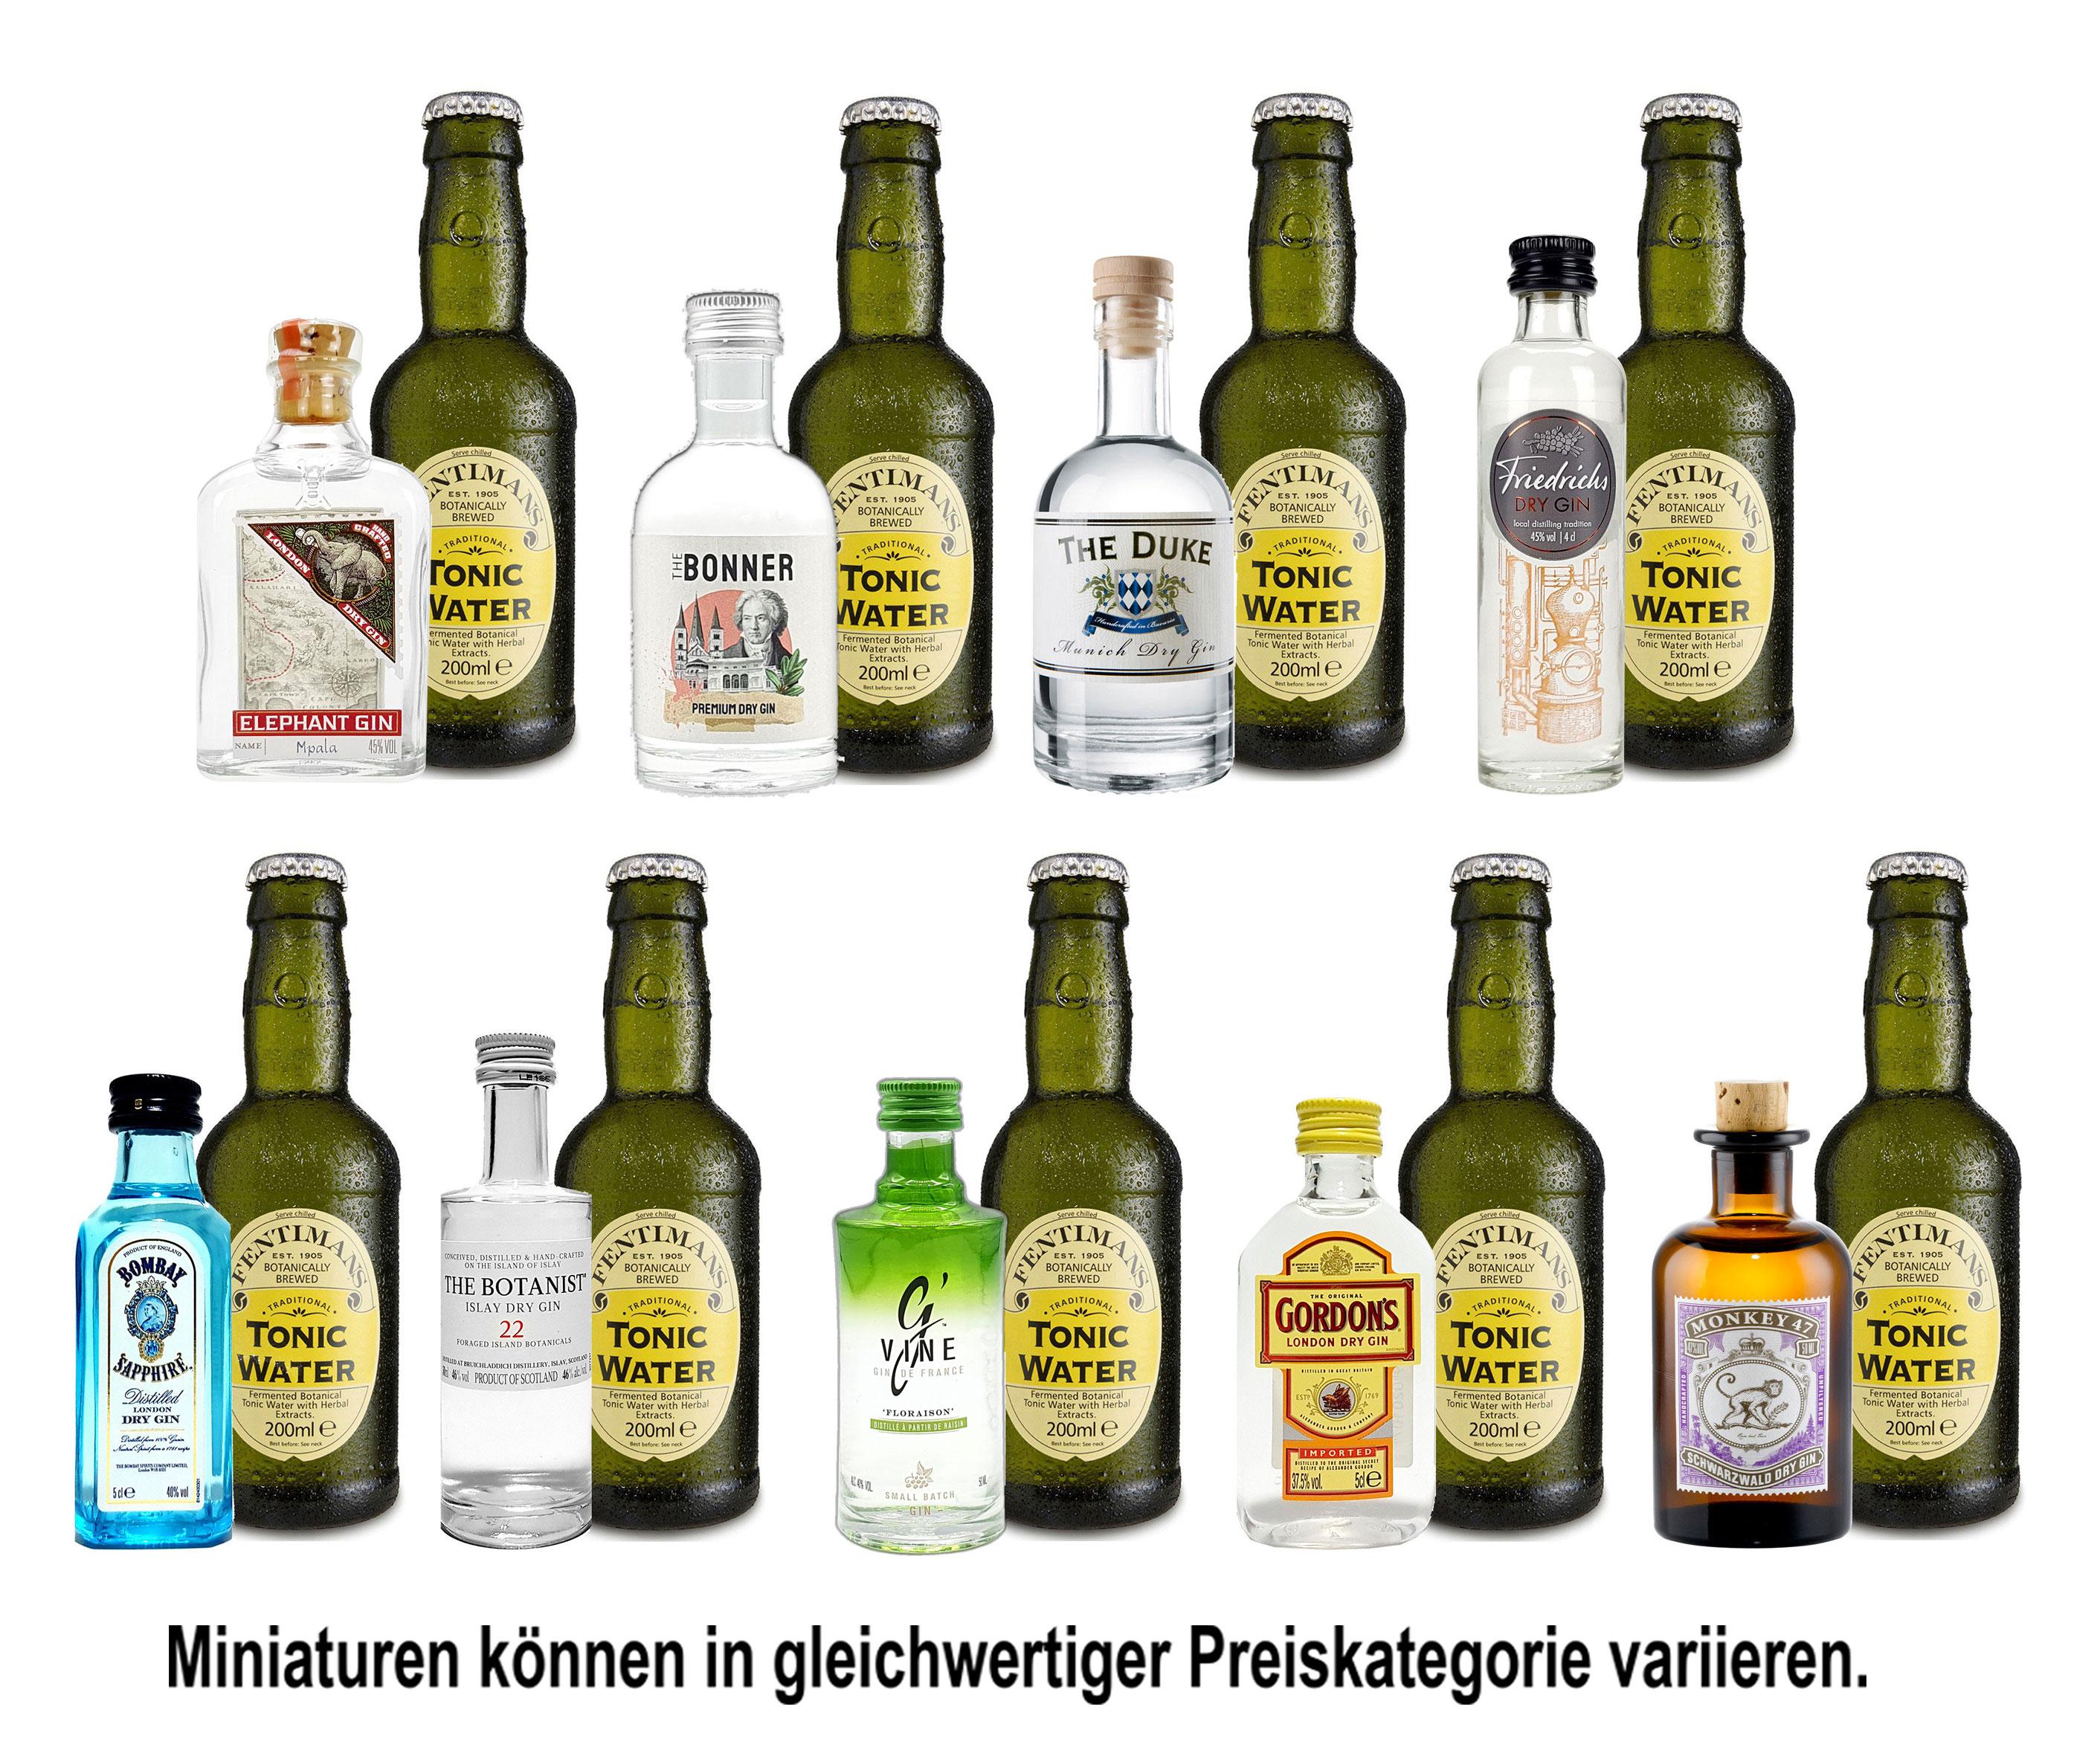 Mini Gin Tonic Probierset - 9 verschiedene Gin Sorten + 9x Fentimans Tonic Water 200ml inkl. Pfand MEHRWEG - NEU